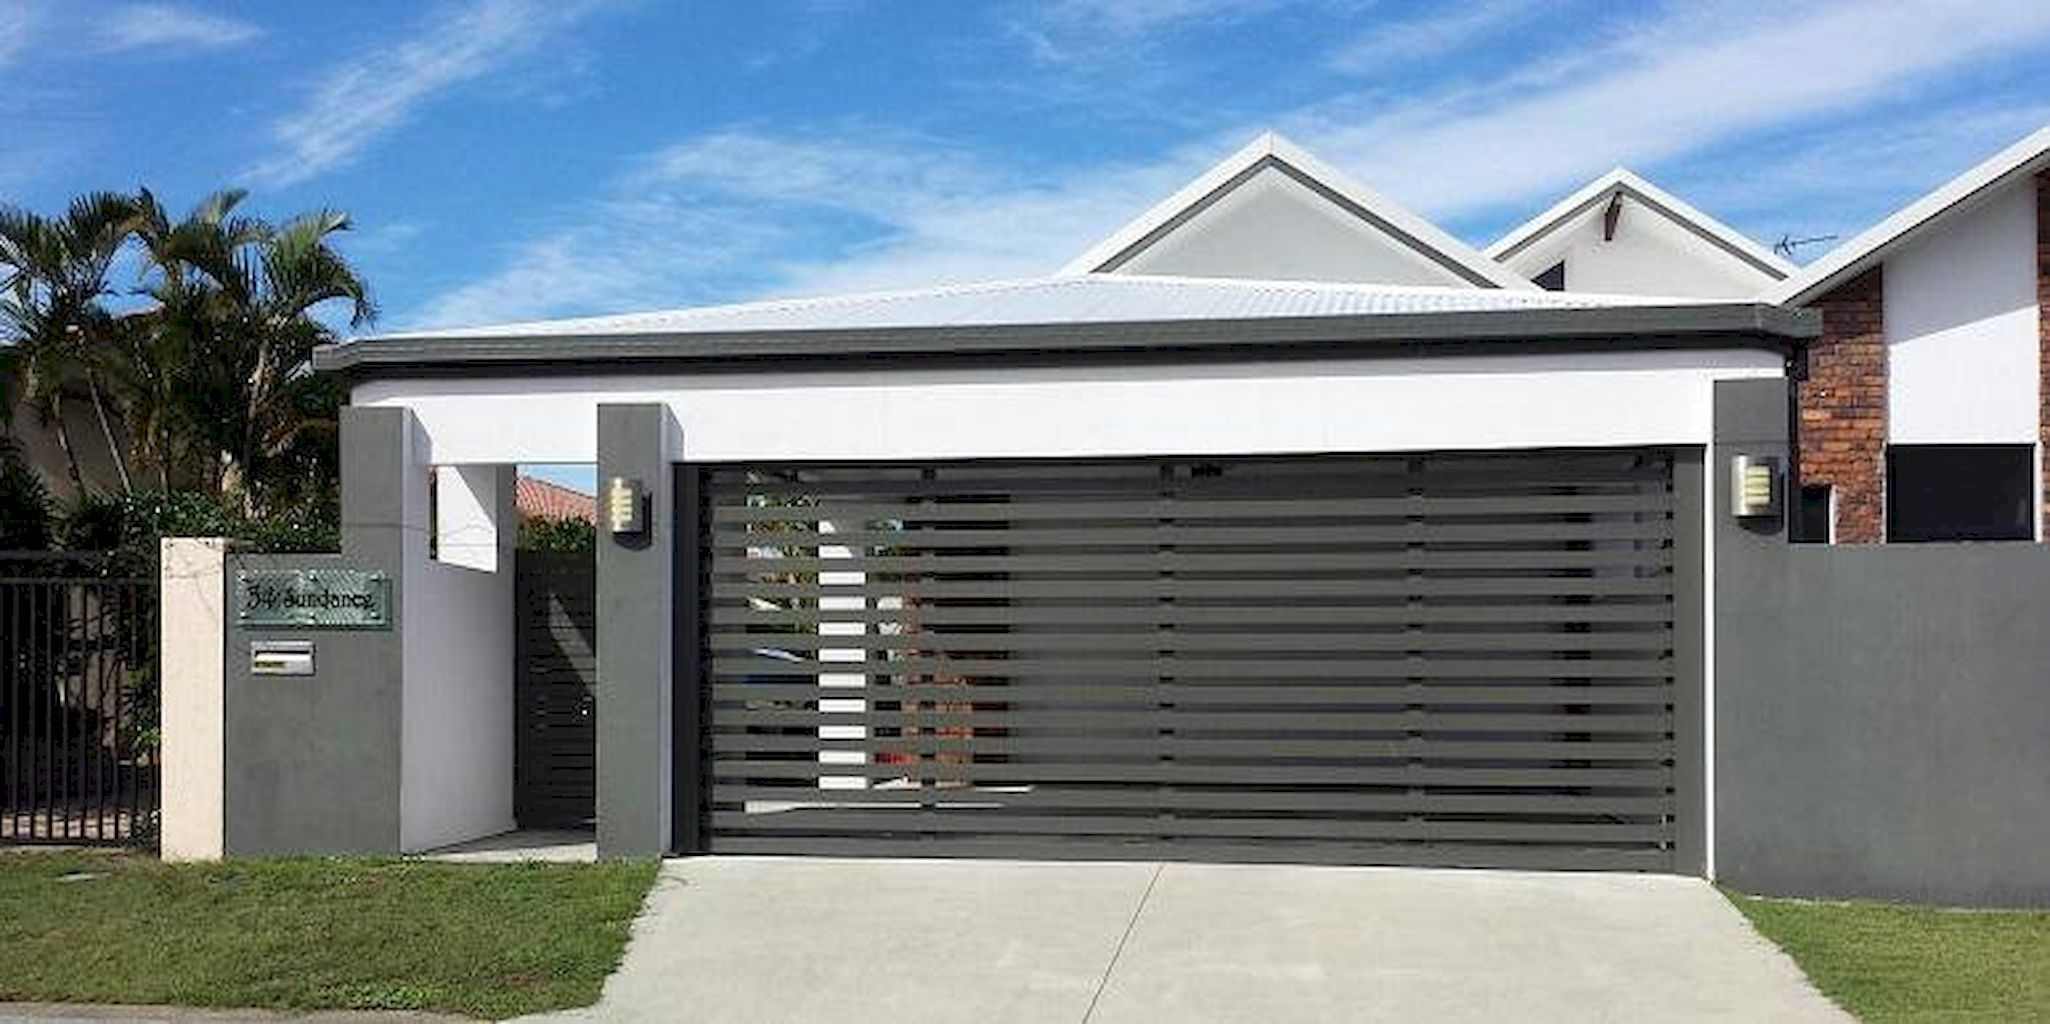 Carport Garage Design Ideas